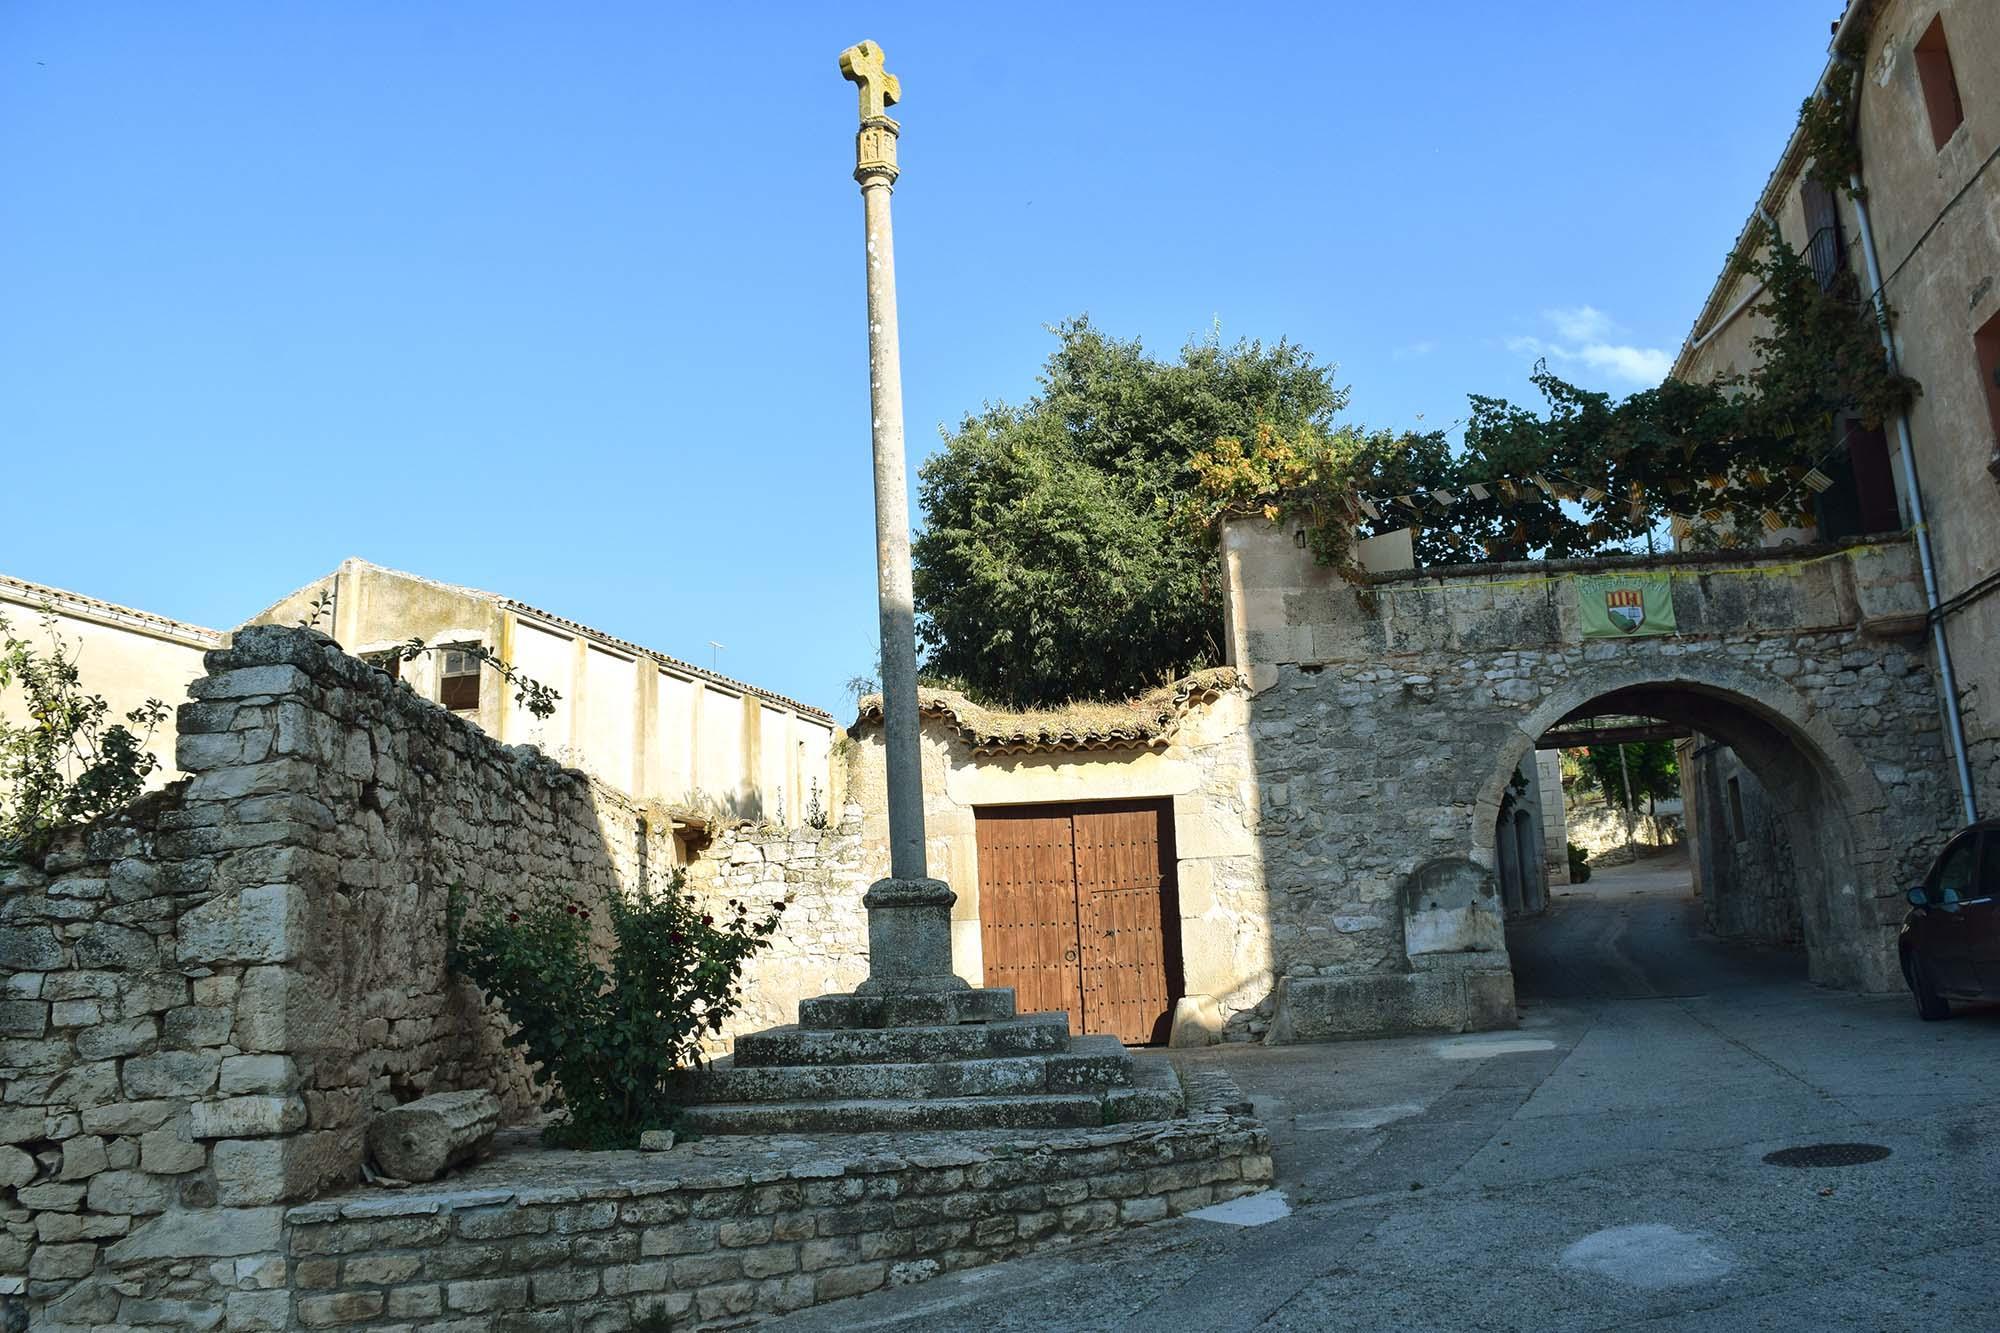 Wayside cross Llorenç de Rocafort